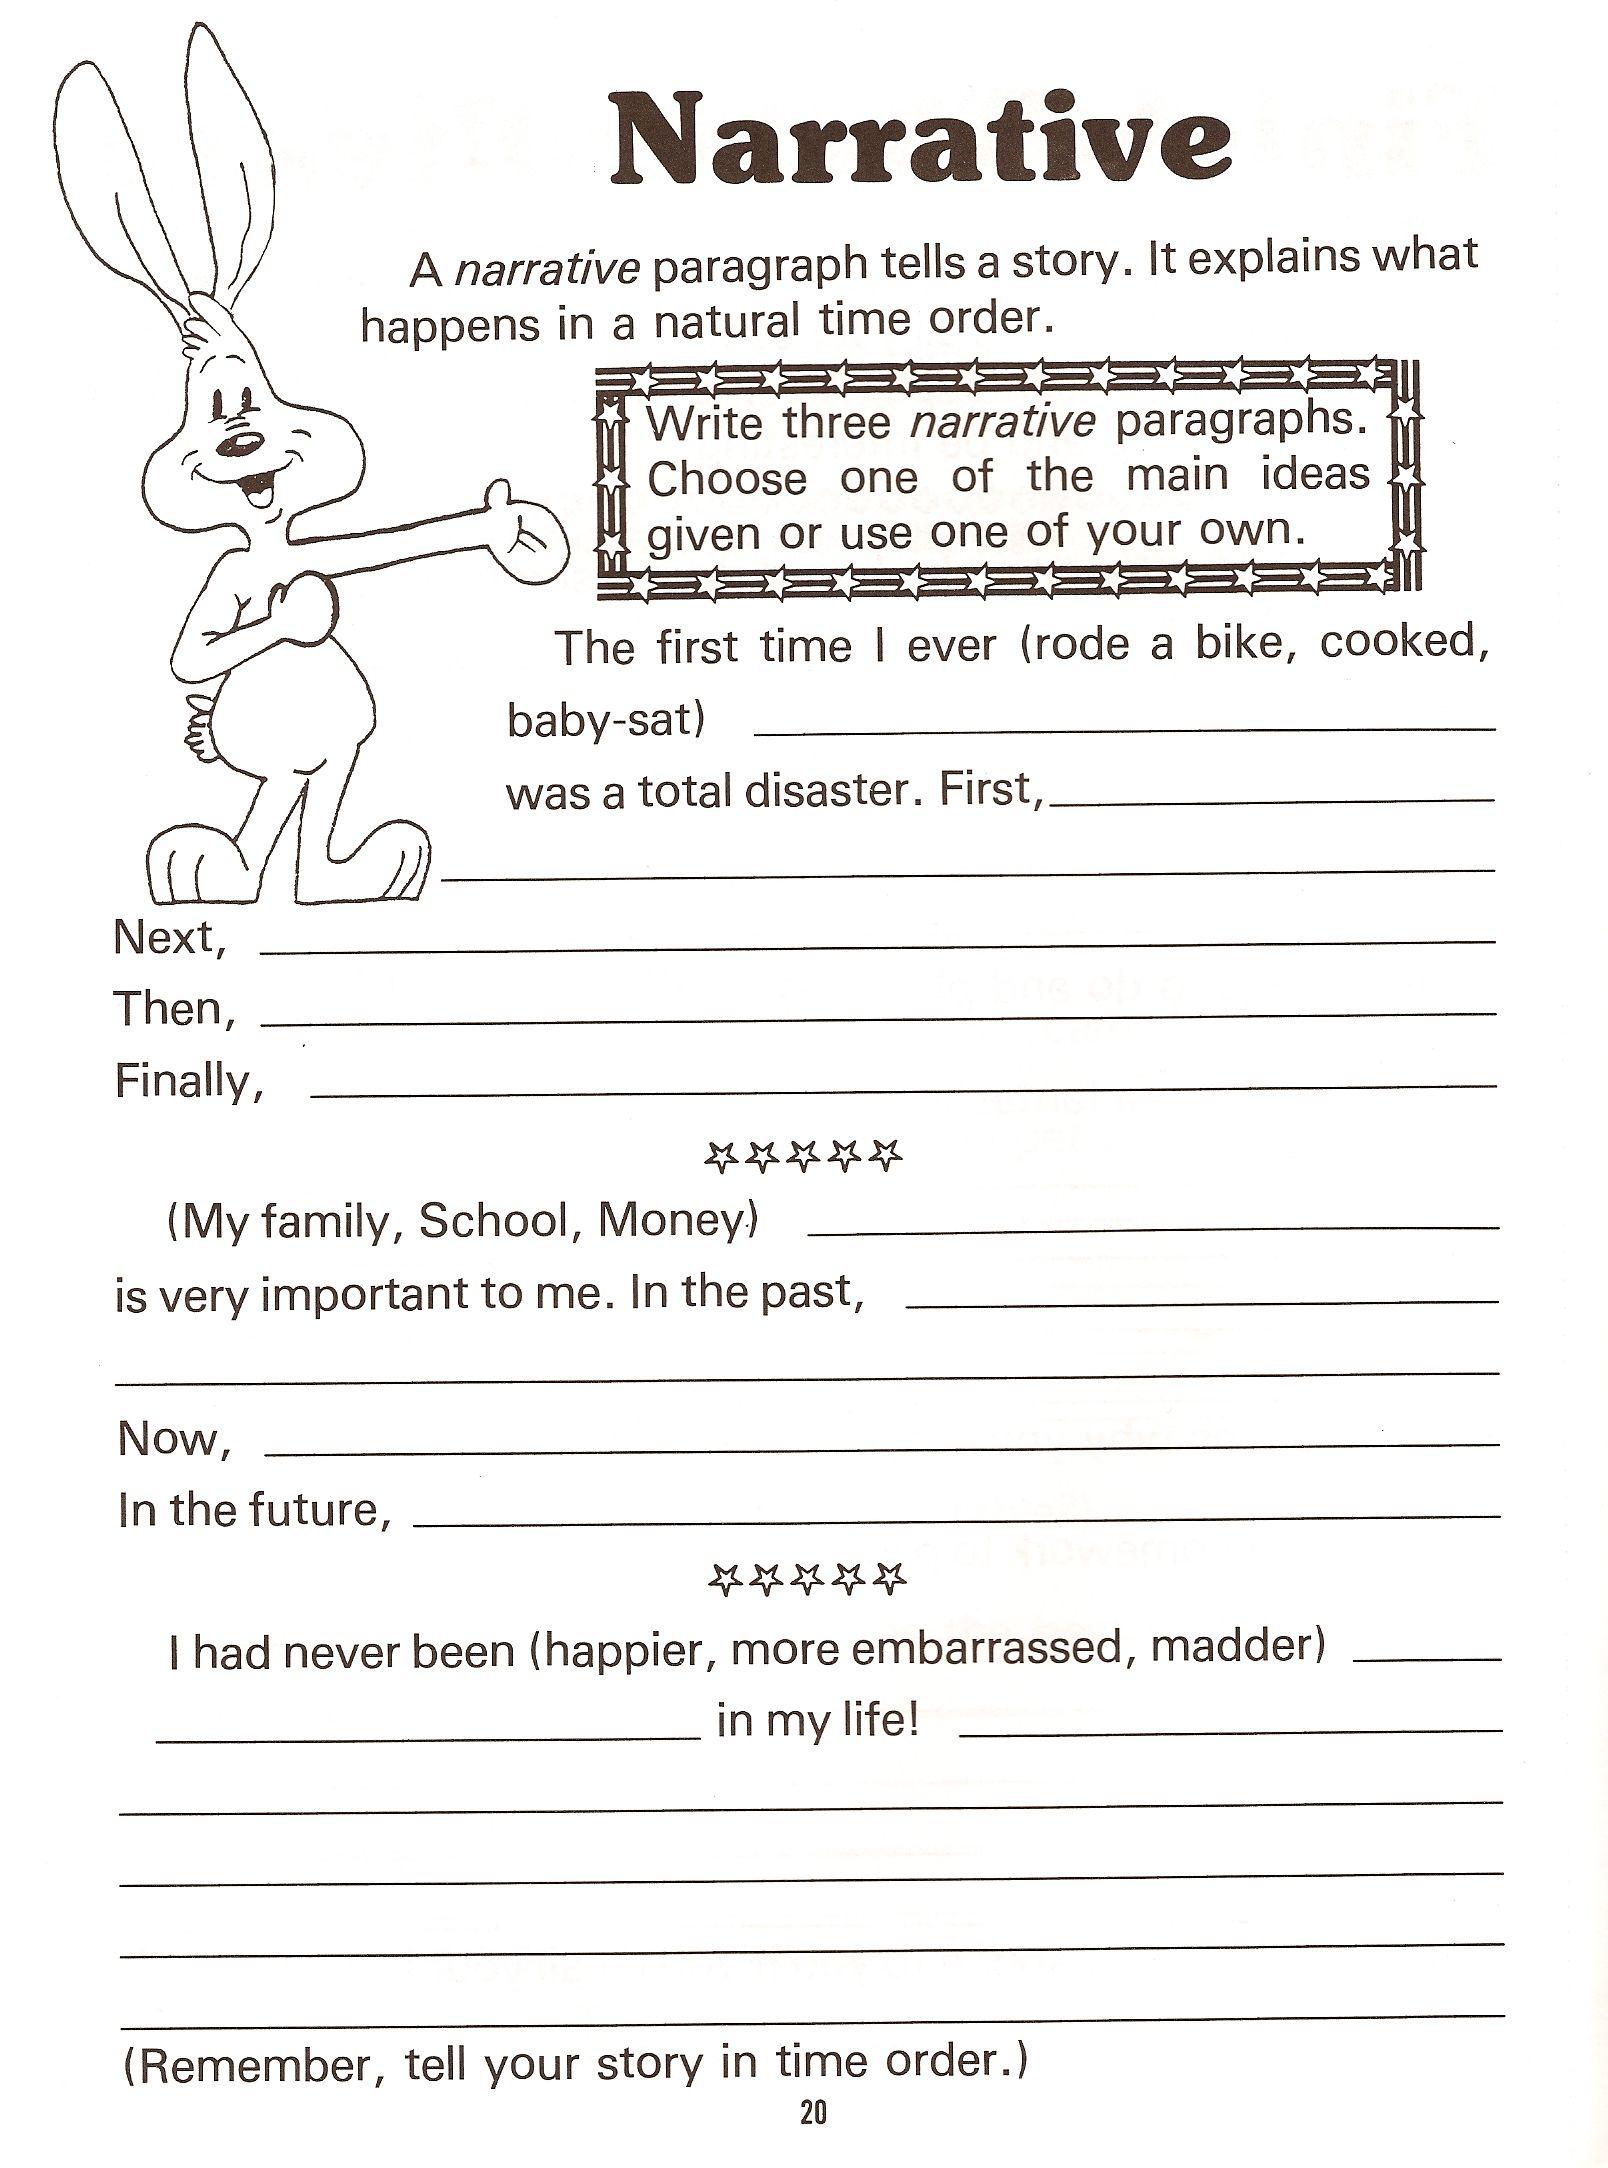 008 Essay Example Ideas For Narrative Beautiful A Fictional Writing Personal Descriptive Full